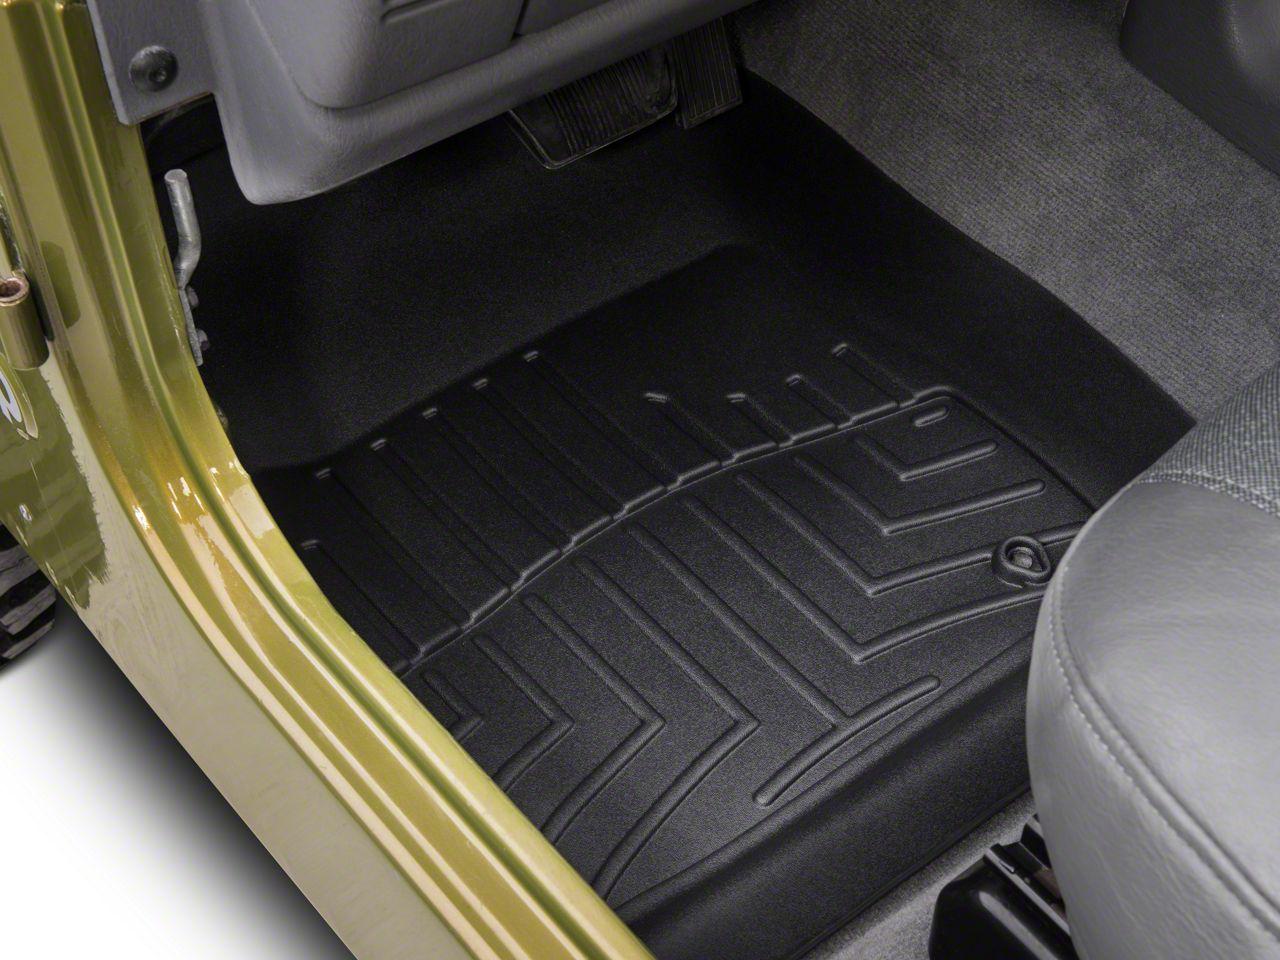 Weathertech DigitalFit Front & Rear Floor Liners - Black (97-06 Jeep Wrangler TJ)